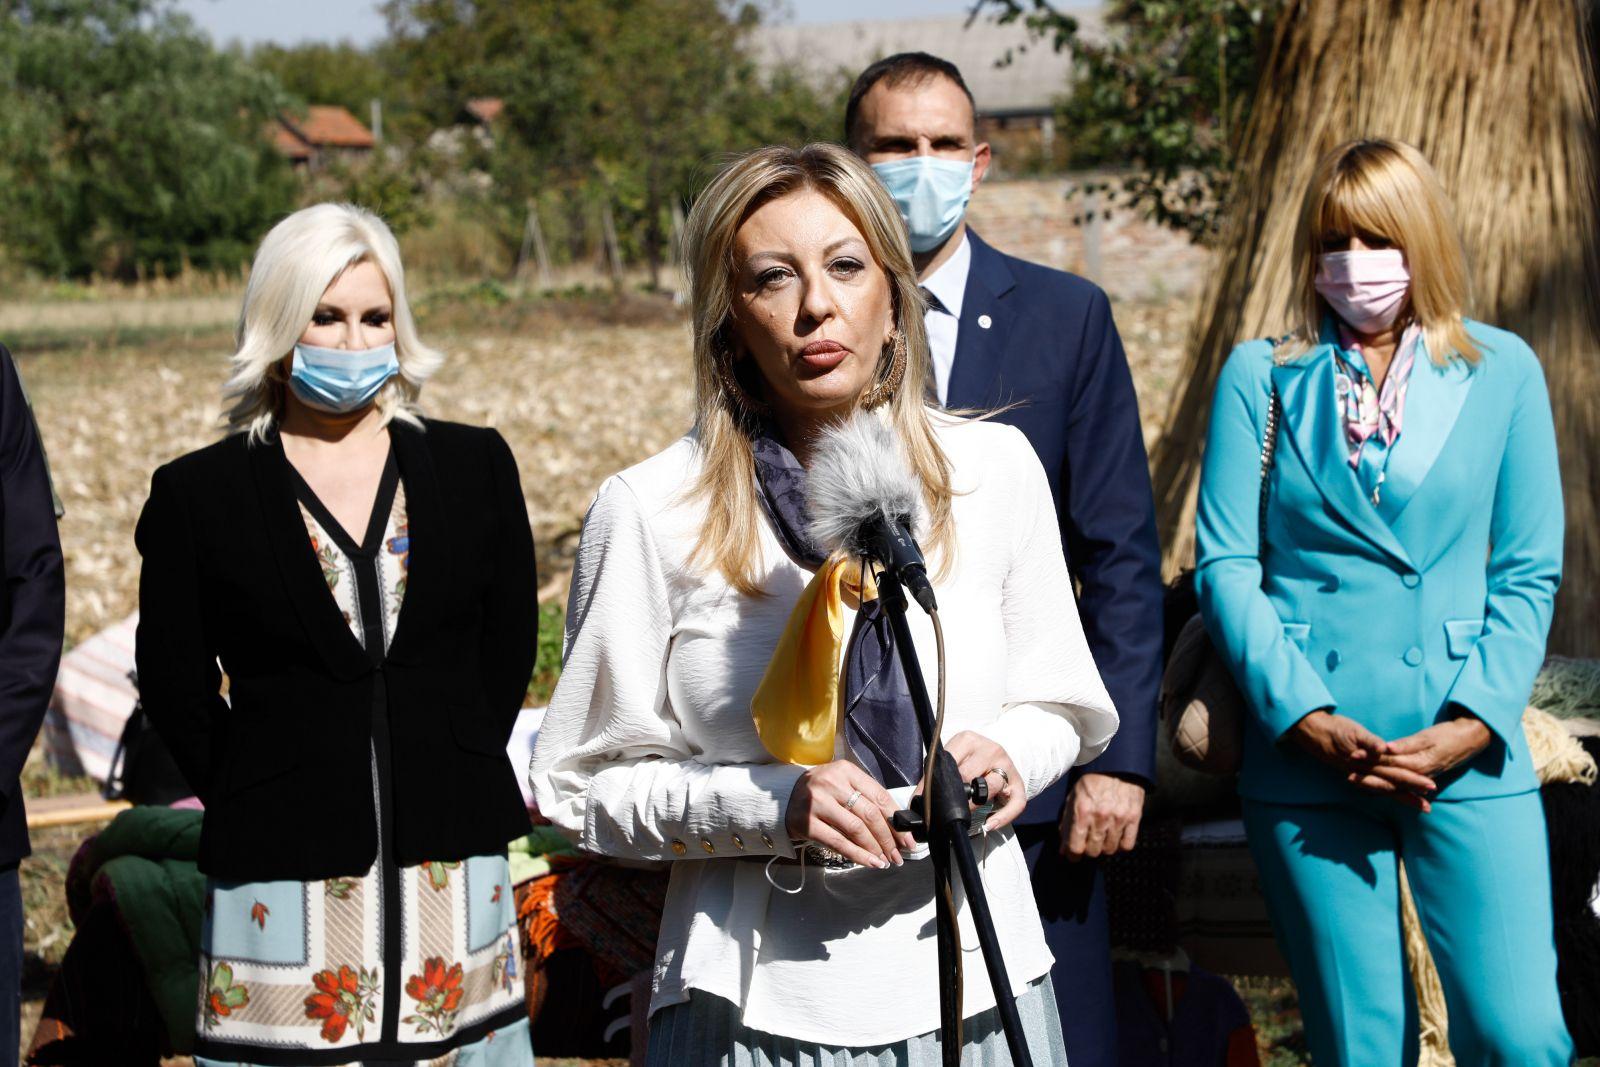 J. Joksimović: Less than 20 per cent of land owners are women